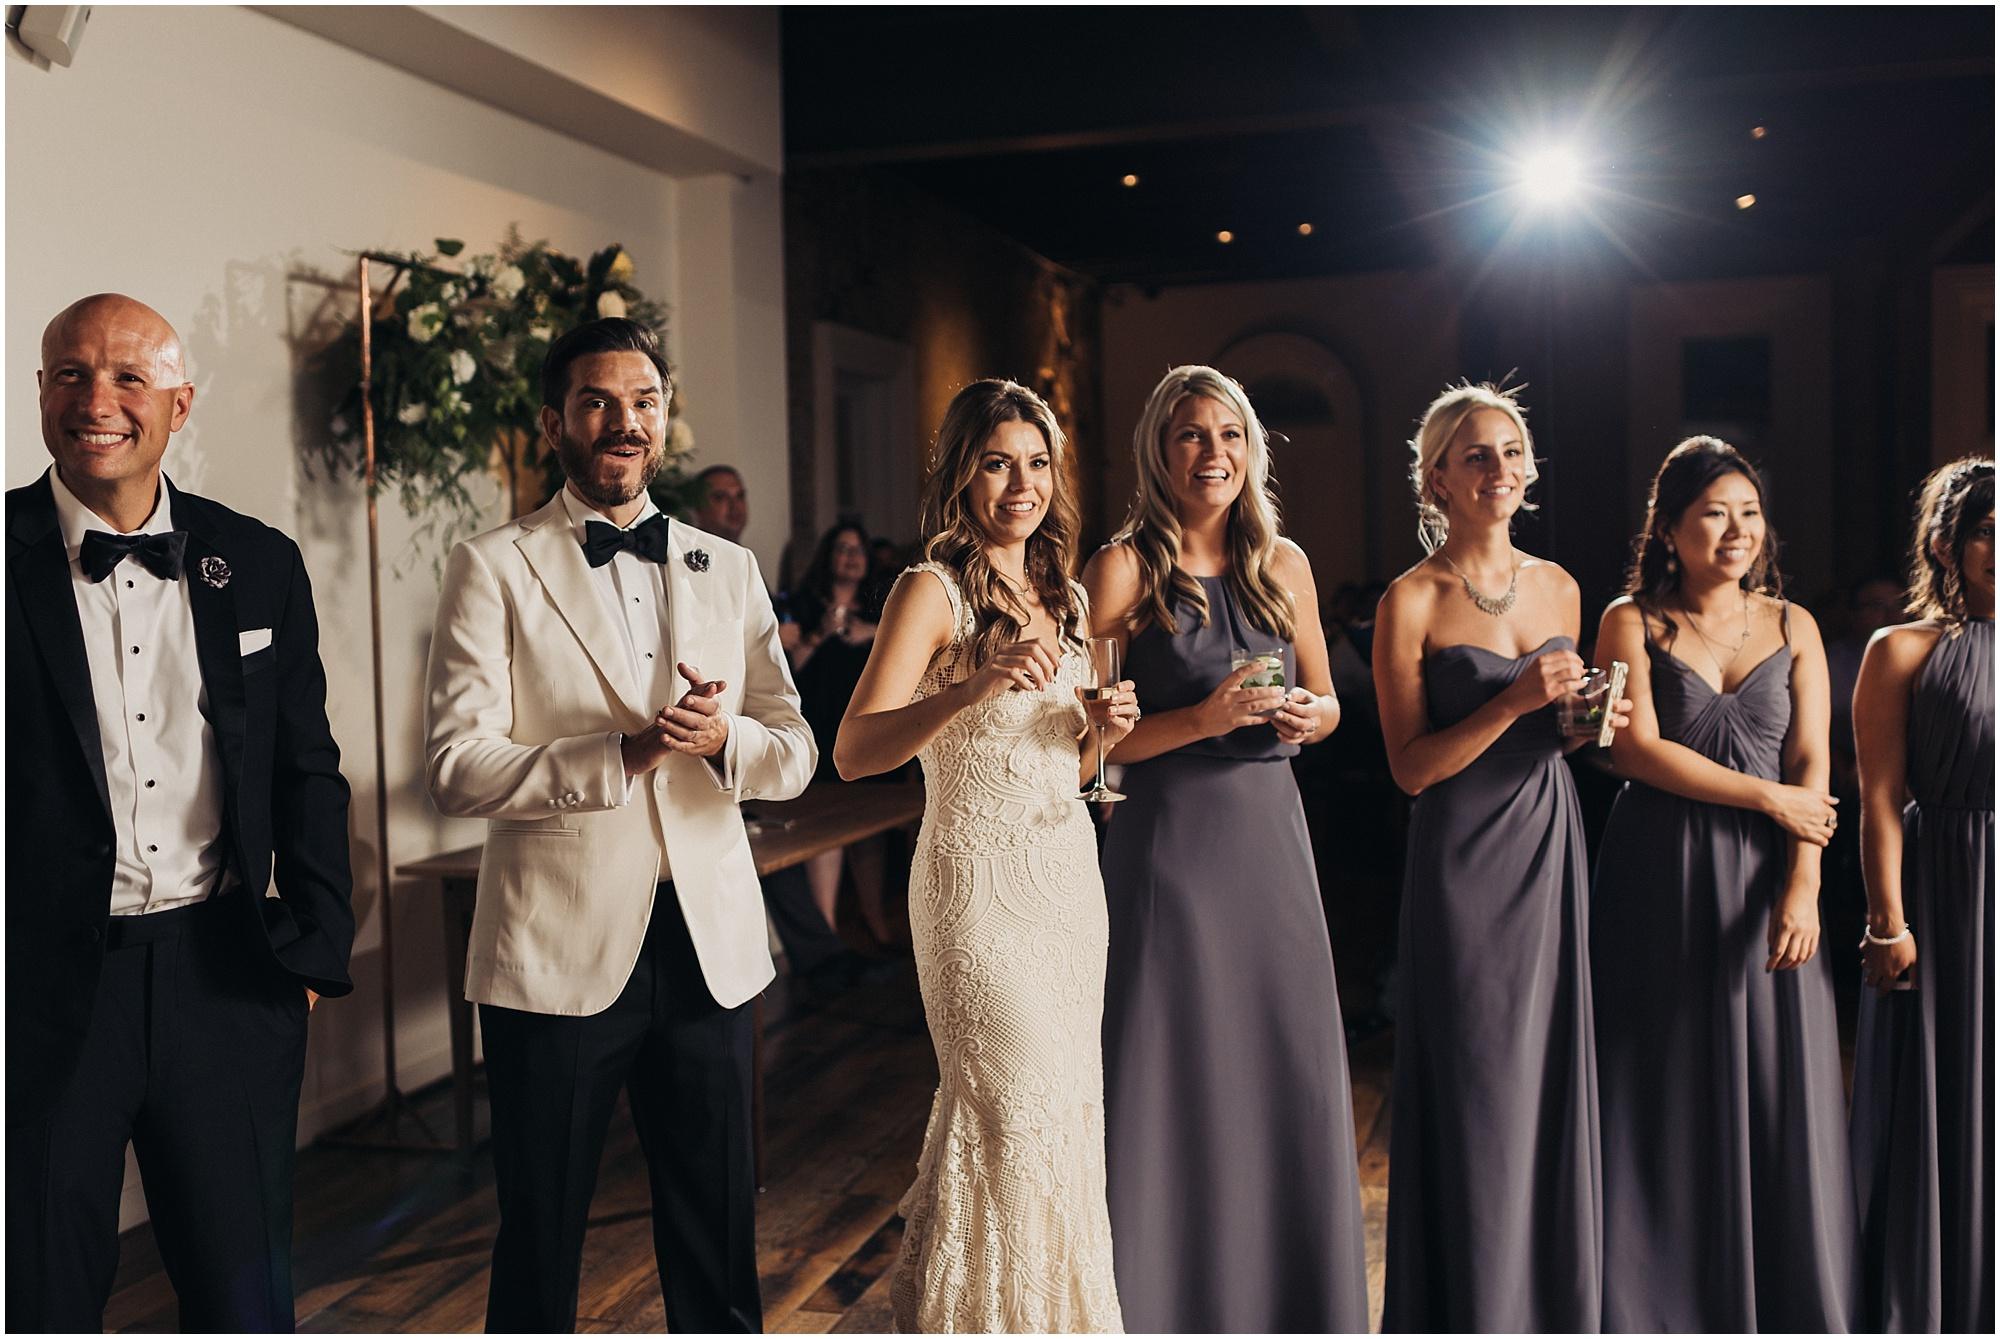 The Cordelle Wedding reception